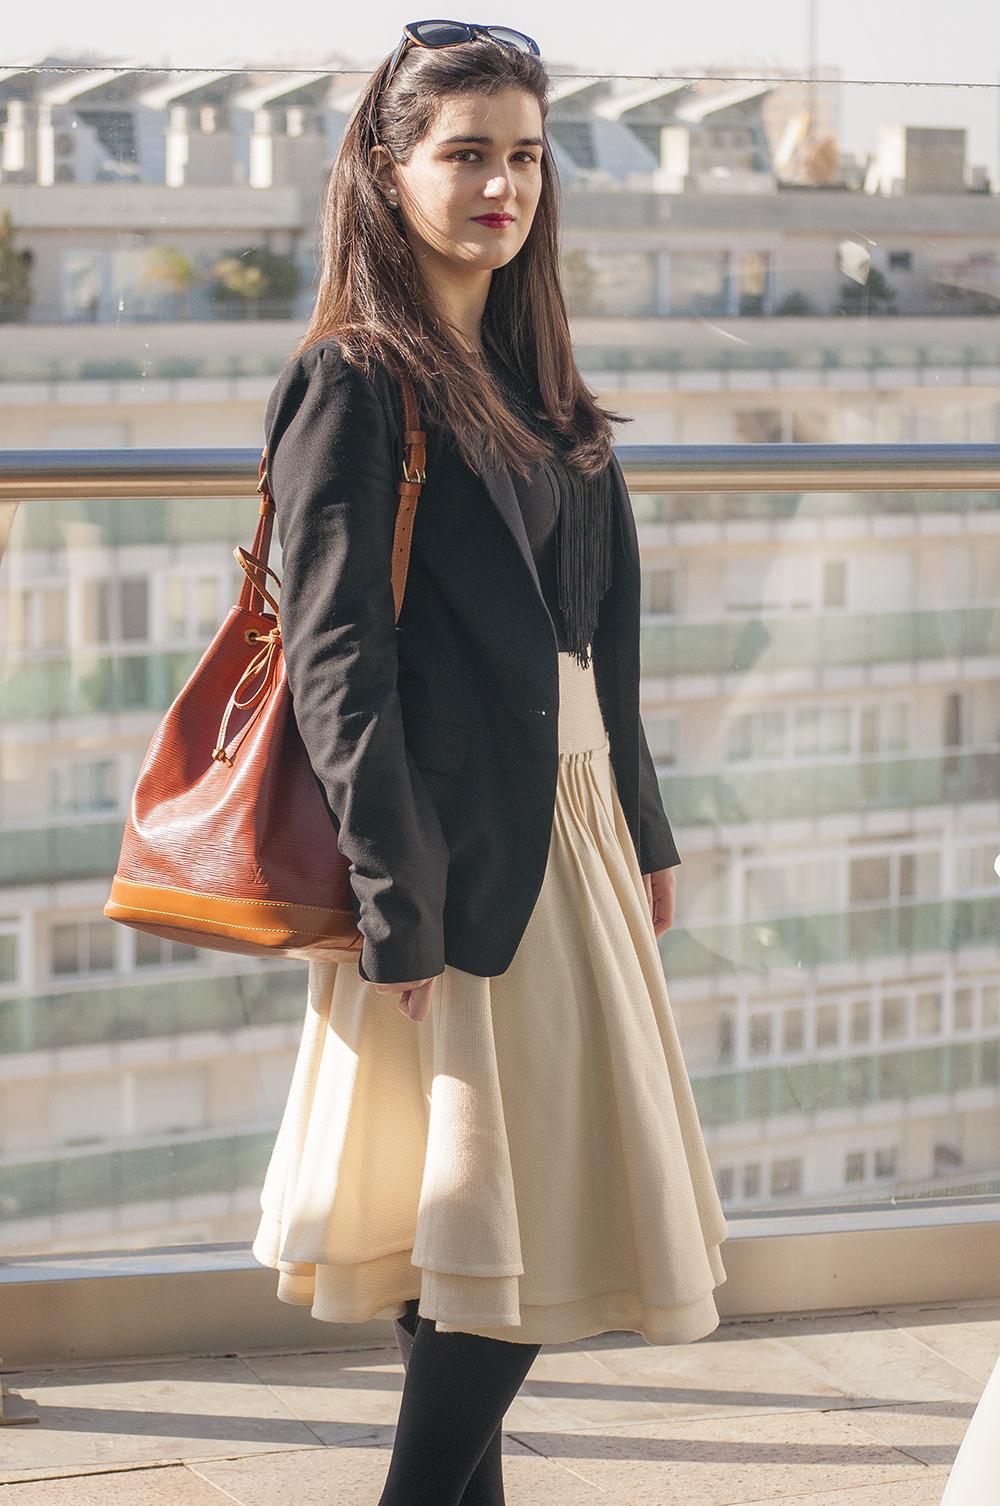 somethingfashion blogger vintage outfit valencia VLC spain_0279